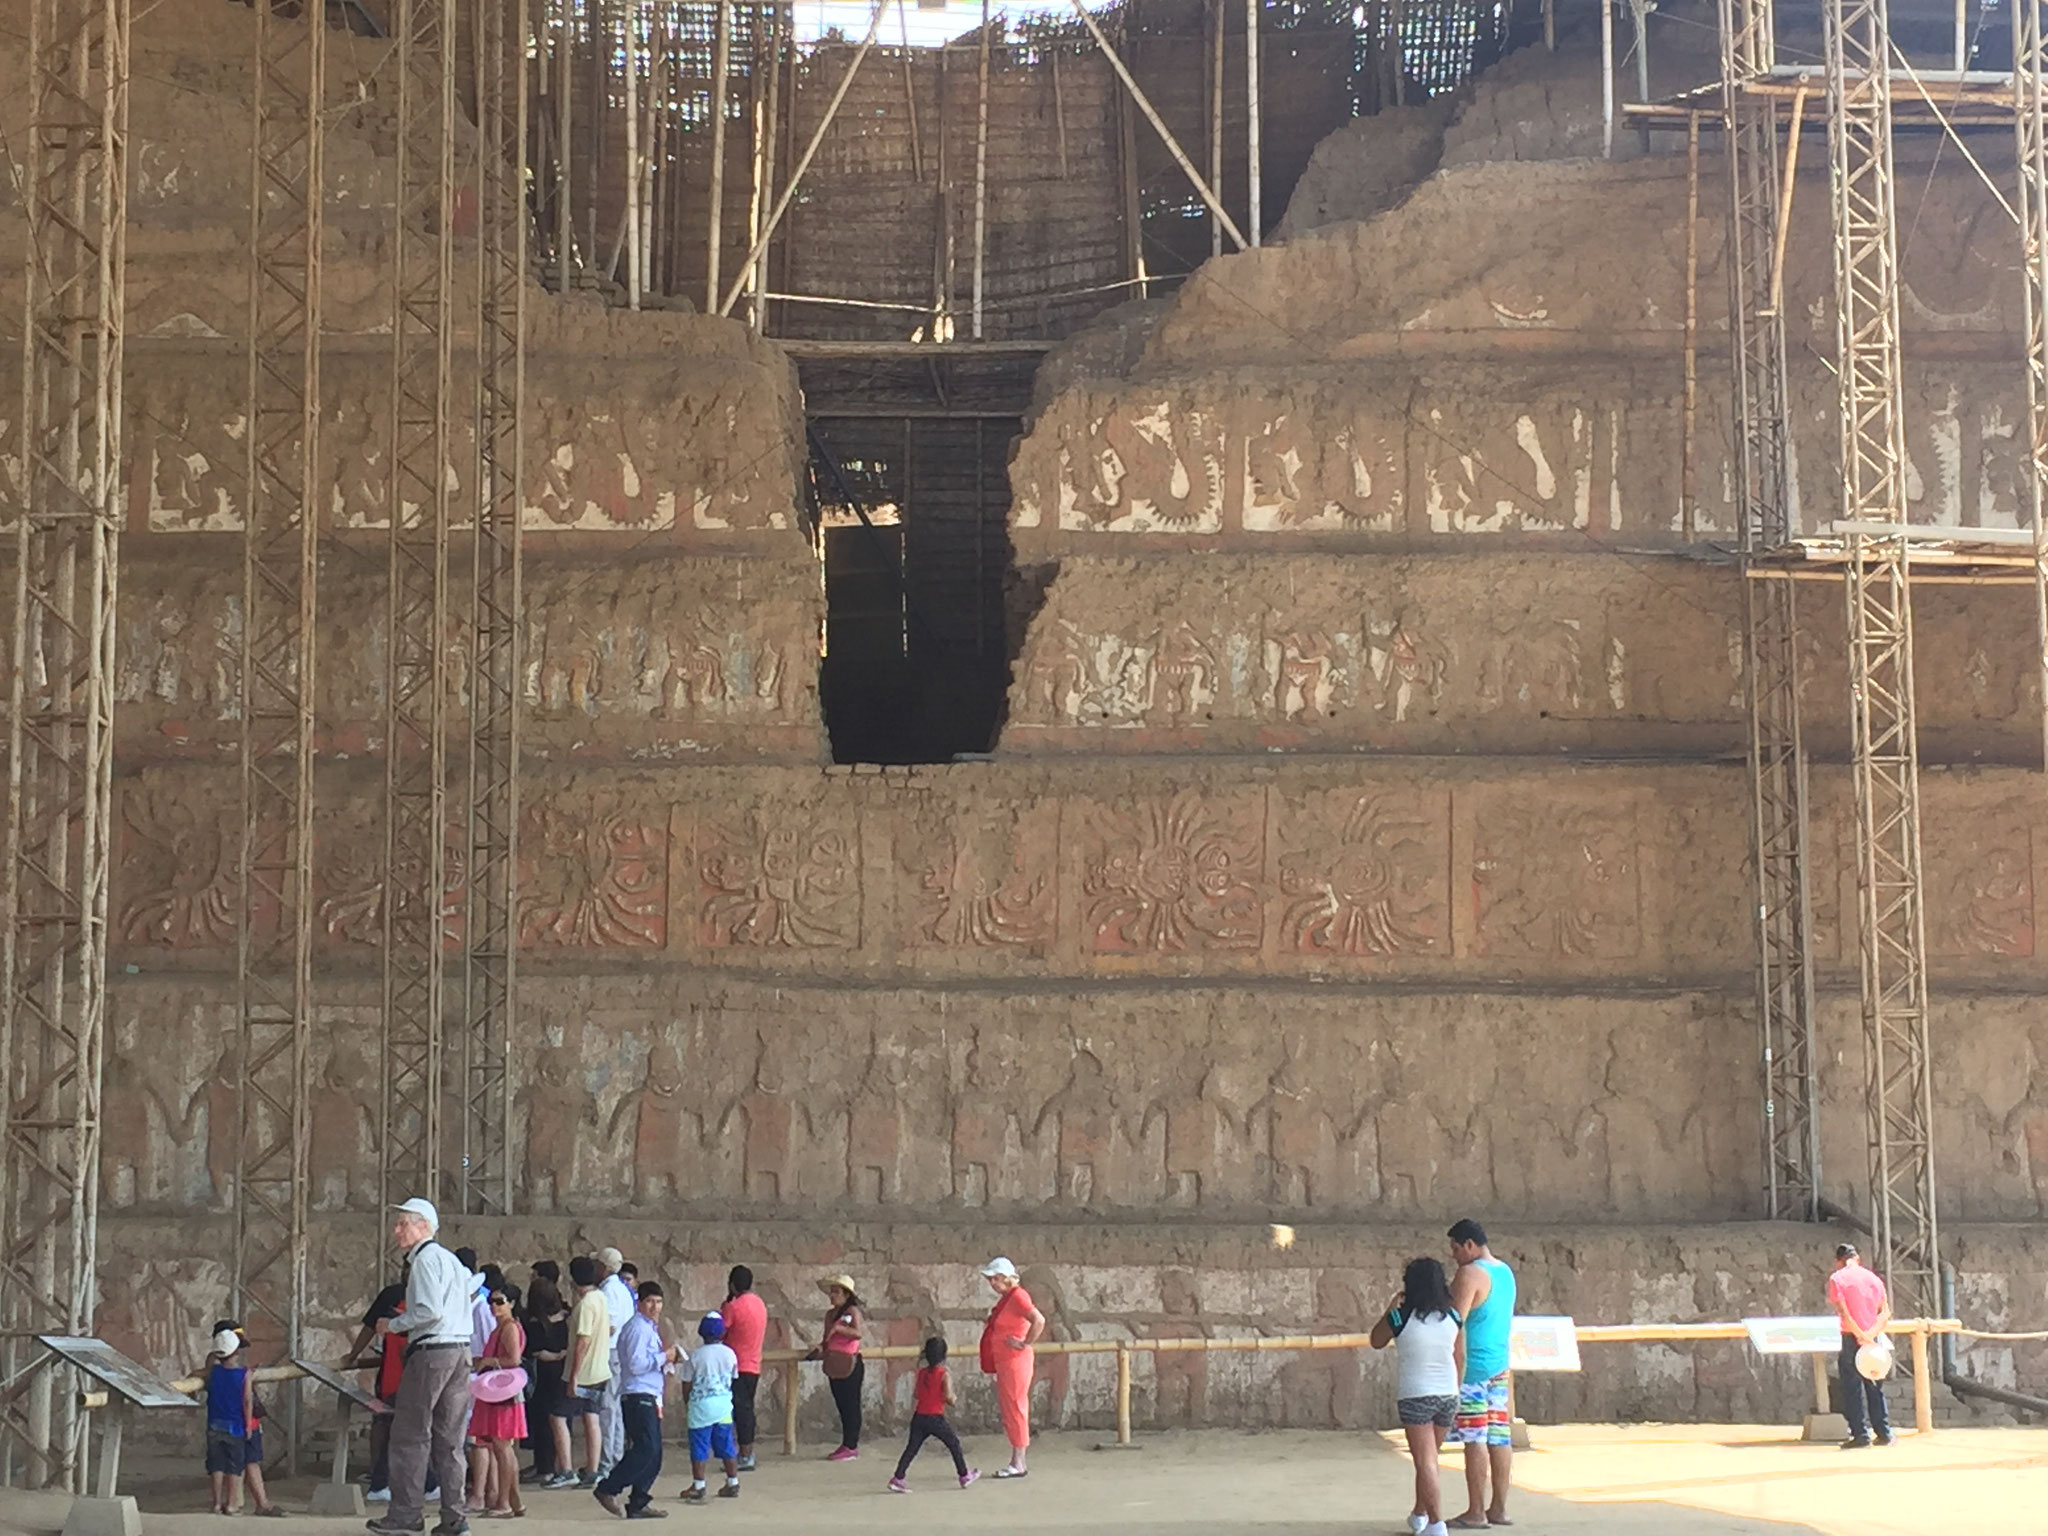 Pyramide del Luna mit den Wandmalereien